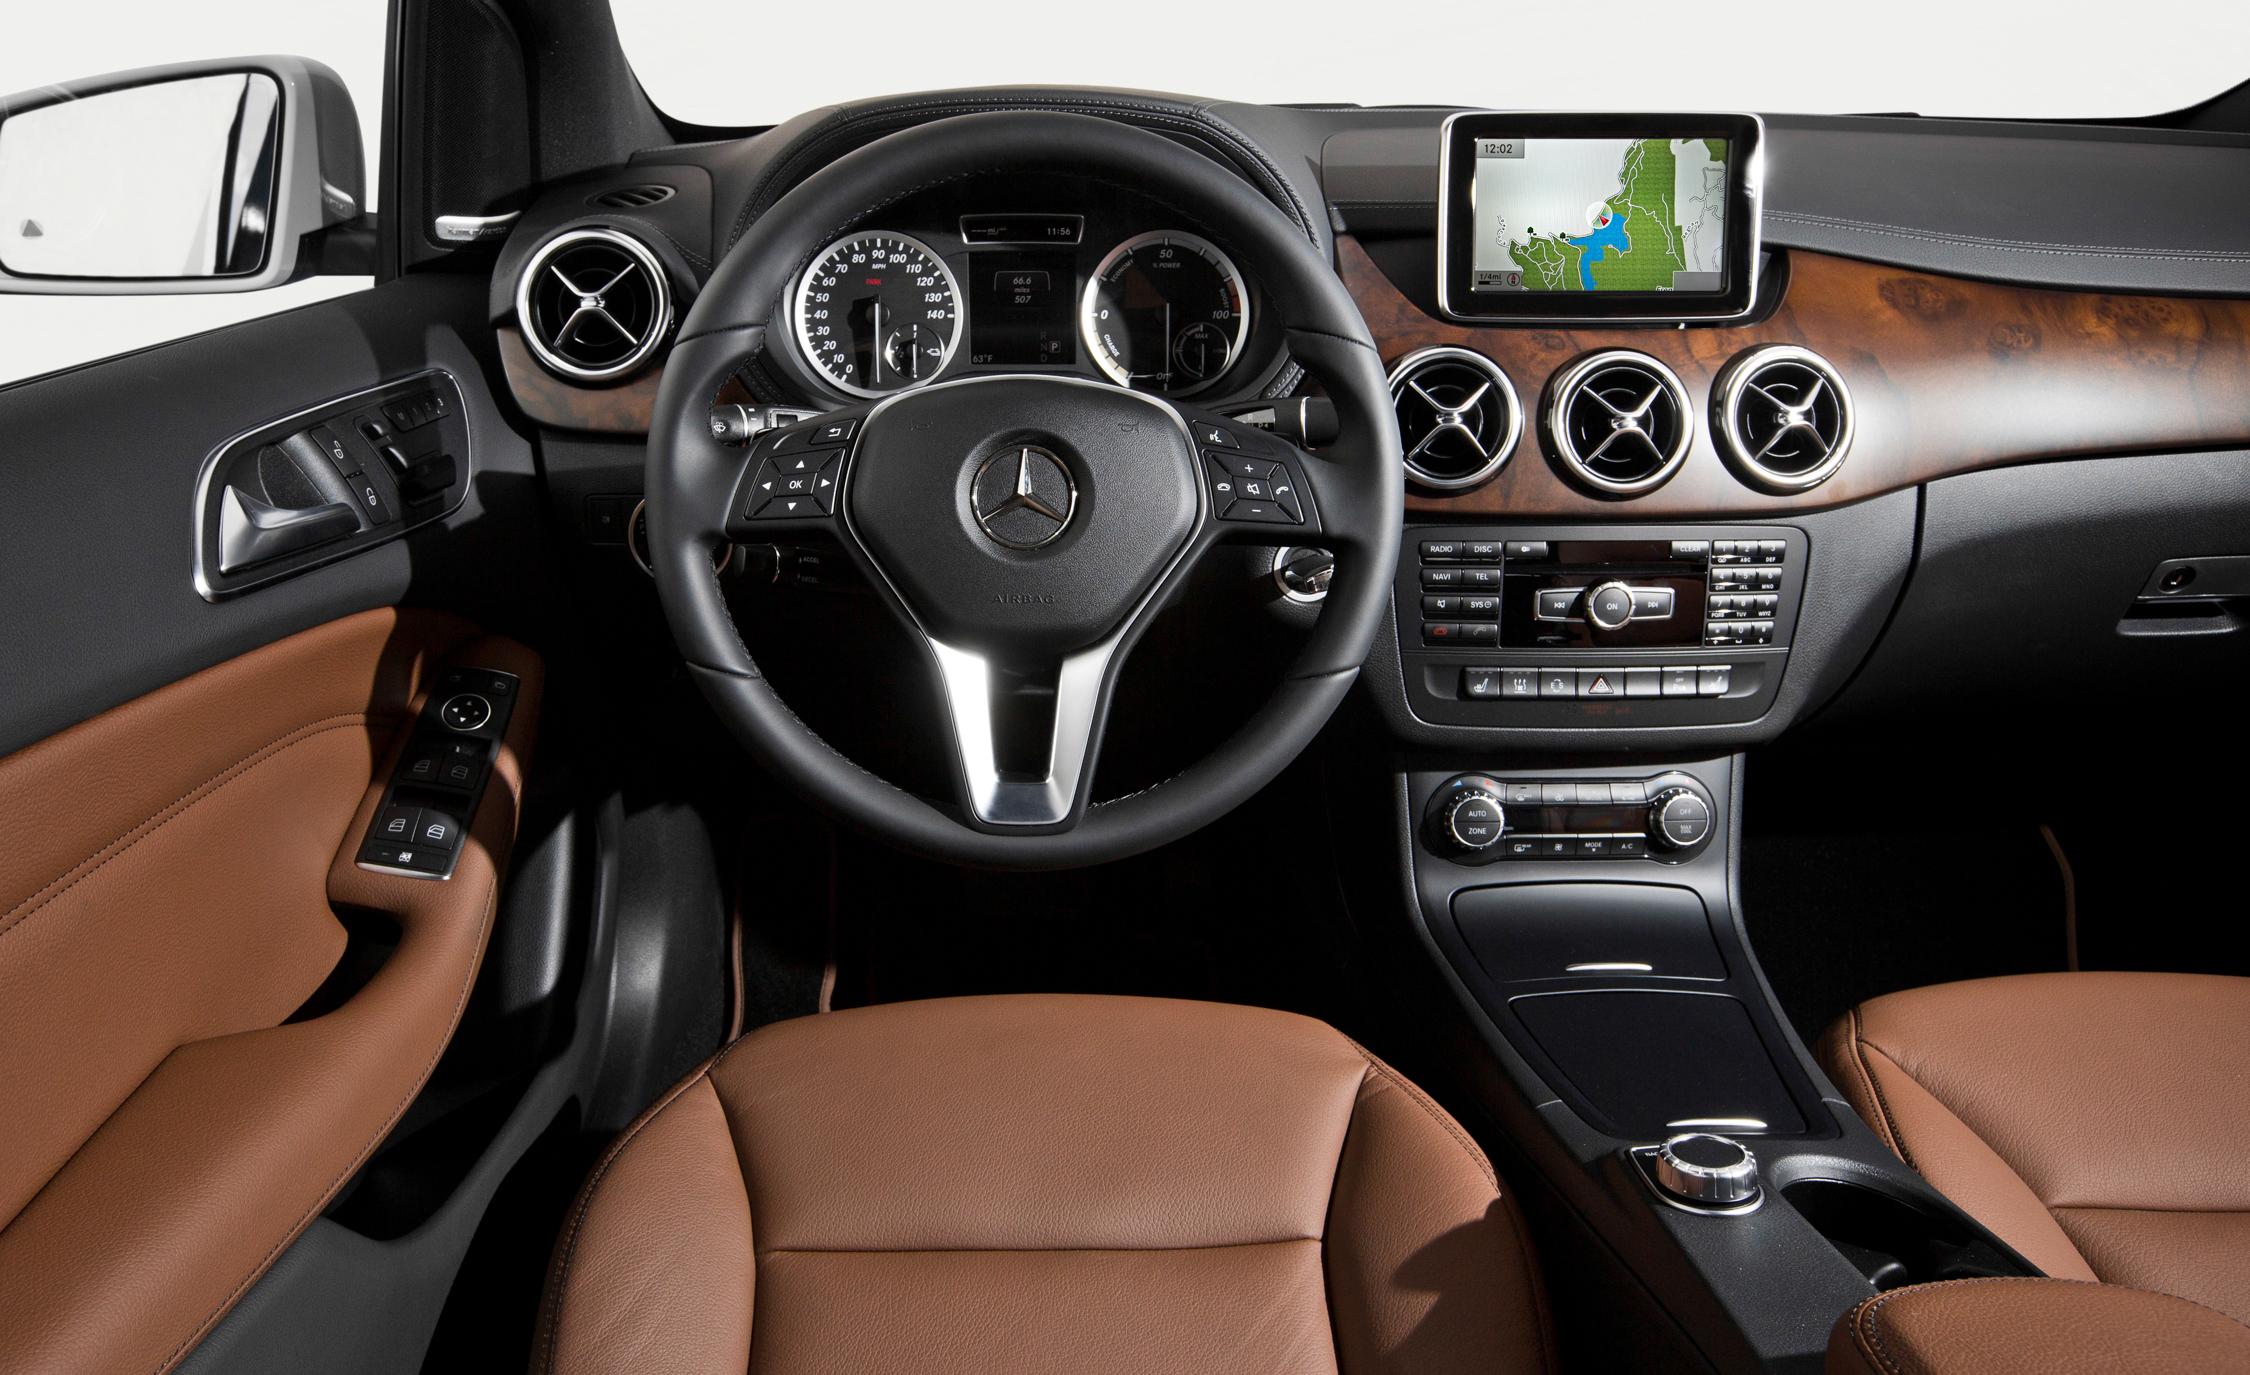 2014 Mercedes-Benz B-class Electric Drive Interior Steering Wheel